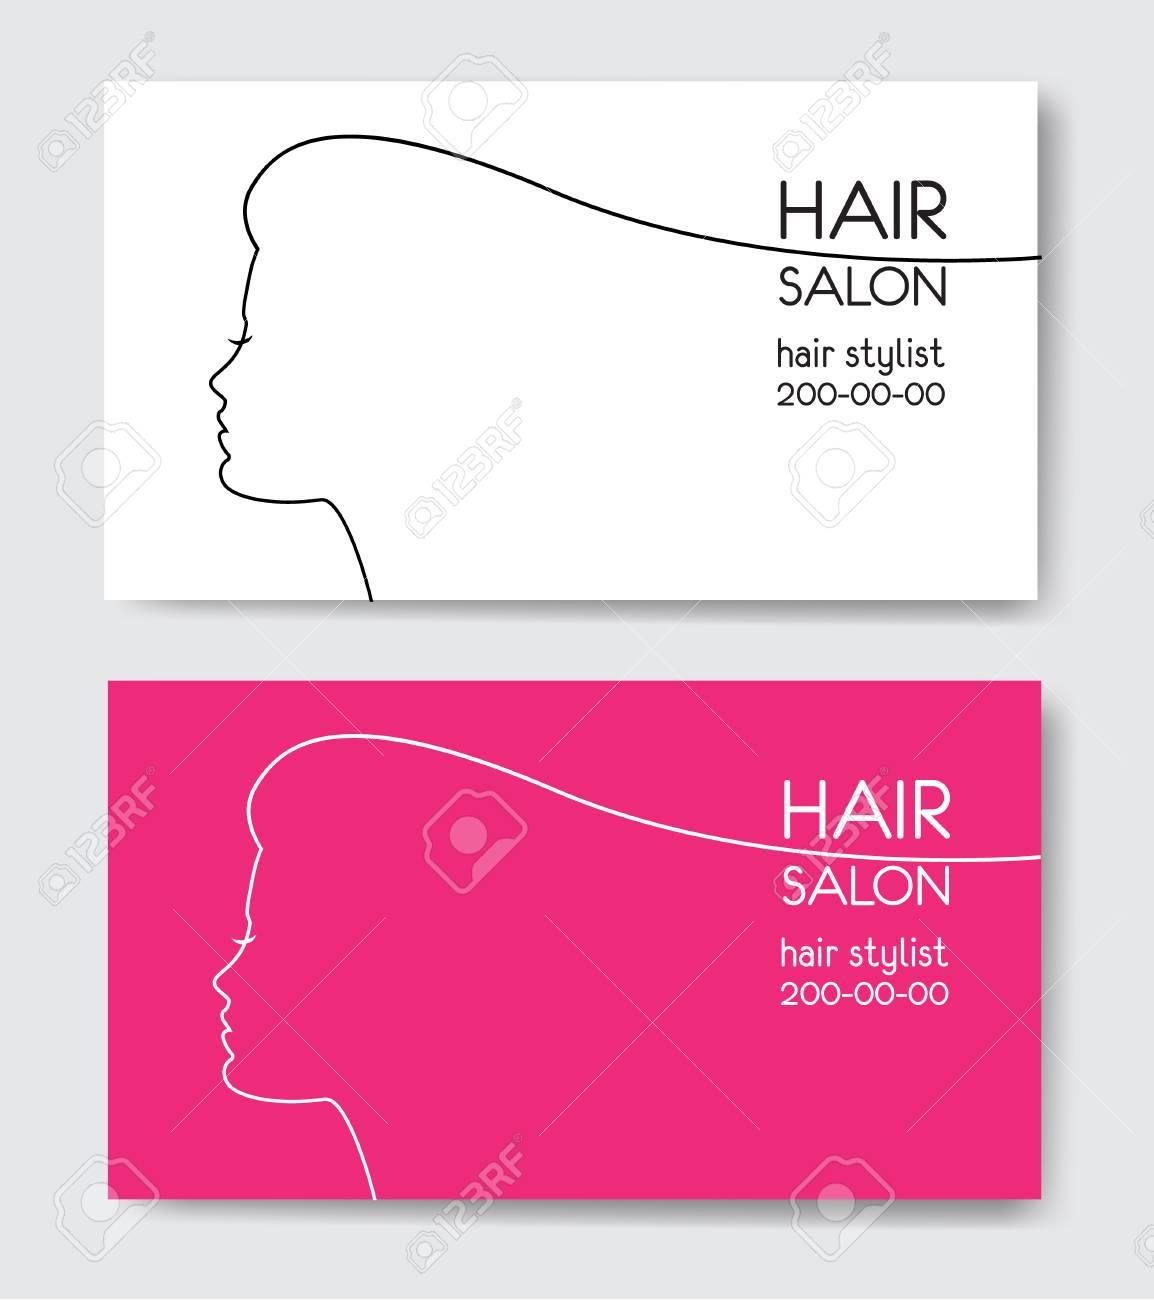 Hair Salon Business Card Templates With Beautiful Woman Face